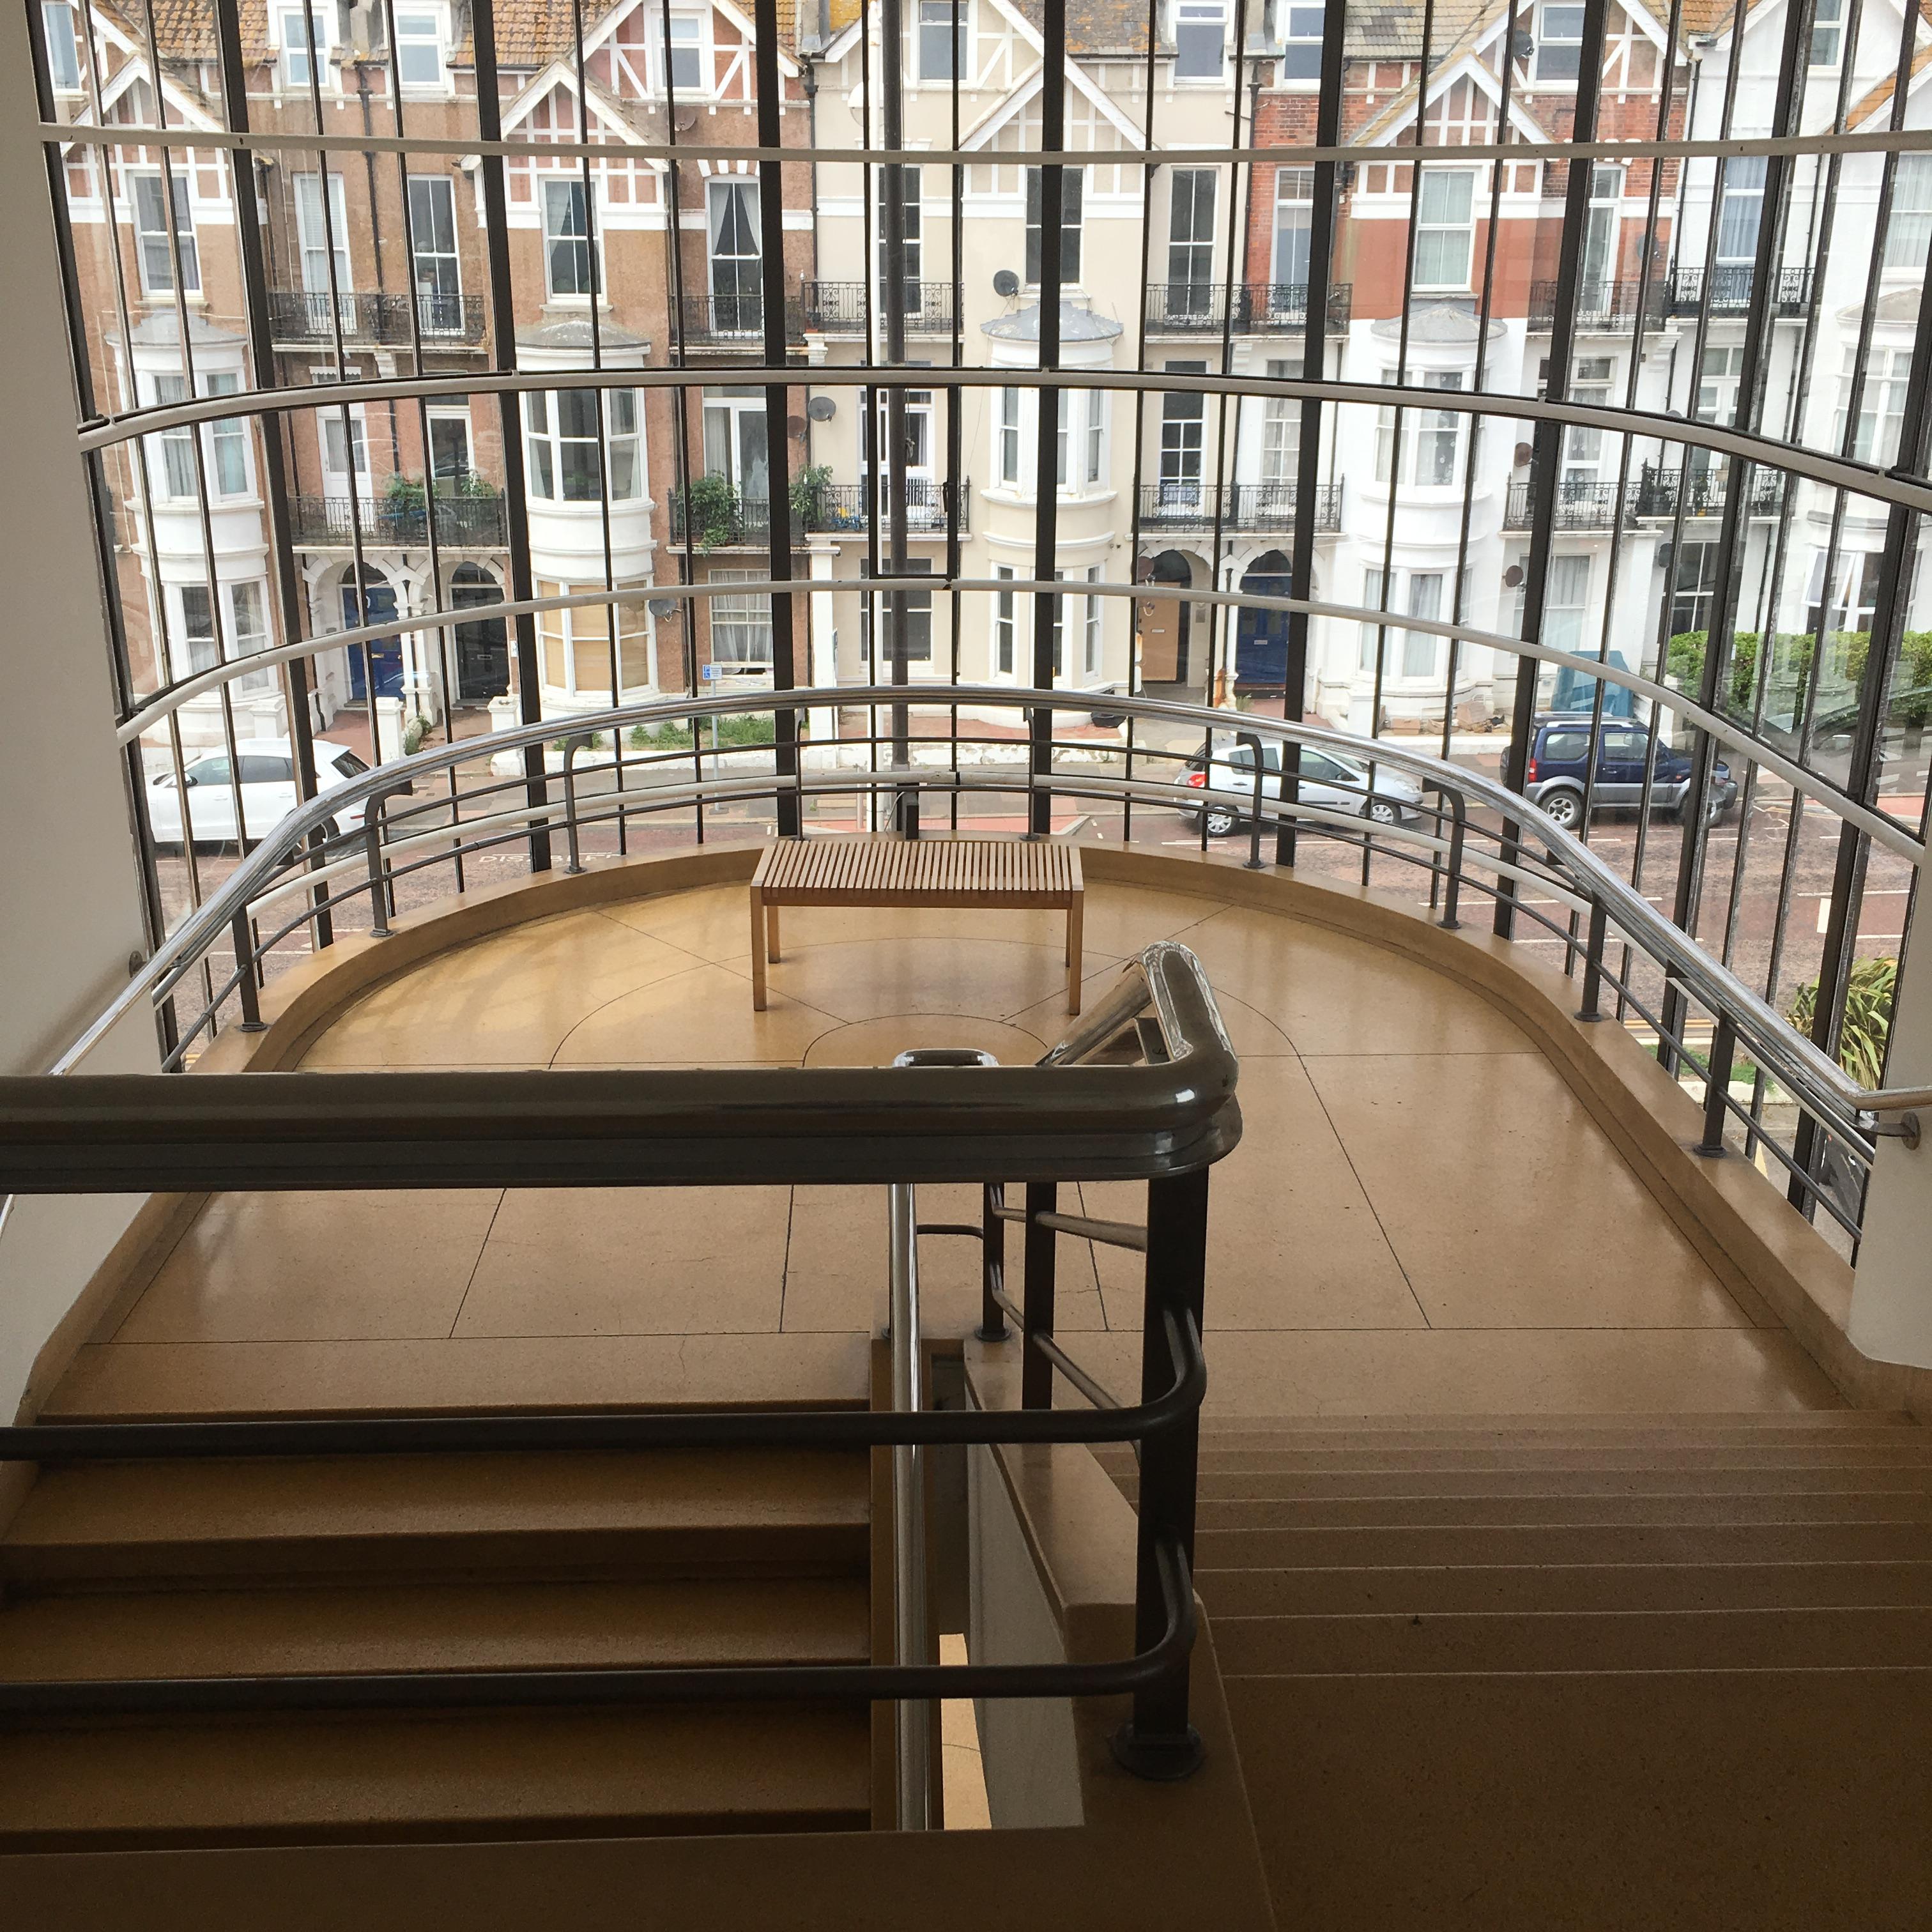 De La Warr Pavilion, Bexhill-on-Sea, East Sussex - interior staircase landside